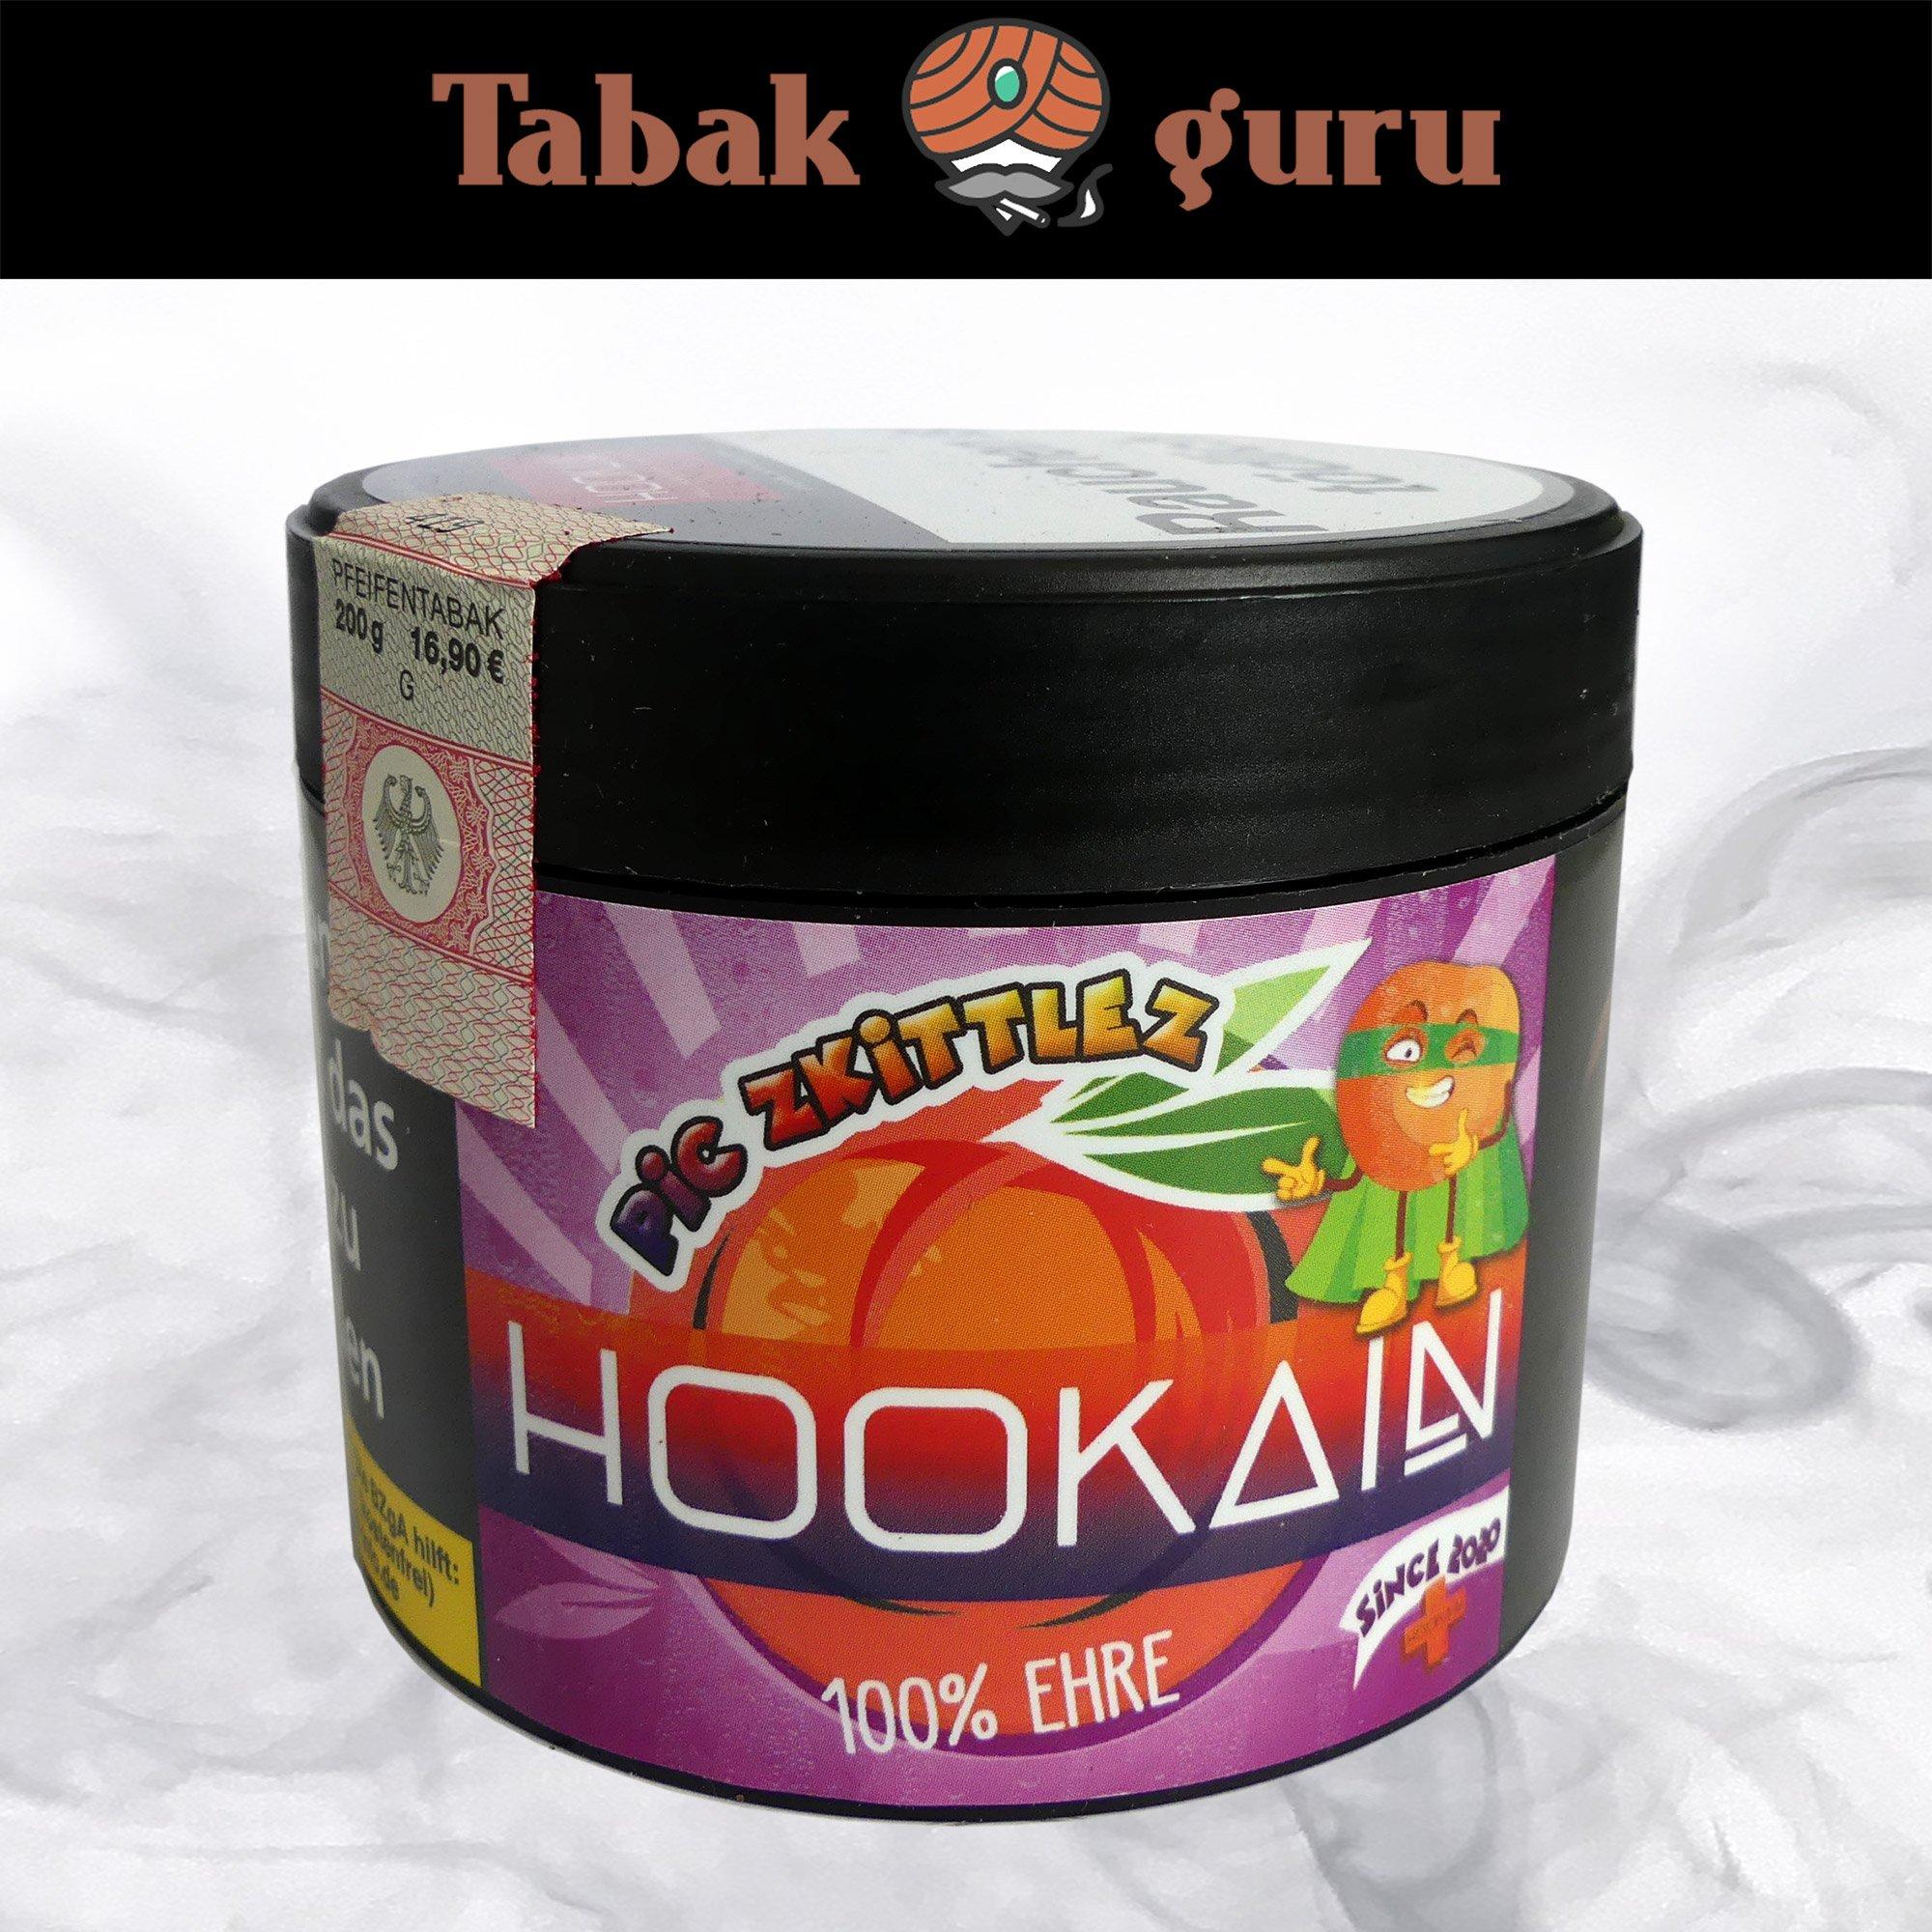 Hookain Pic Zkittlez 200g - Shisha Tabak